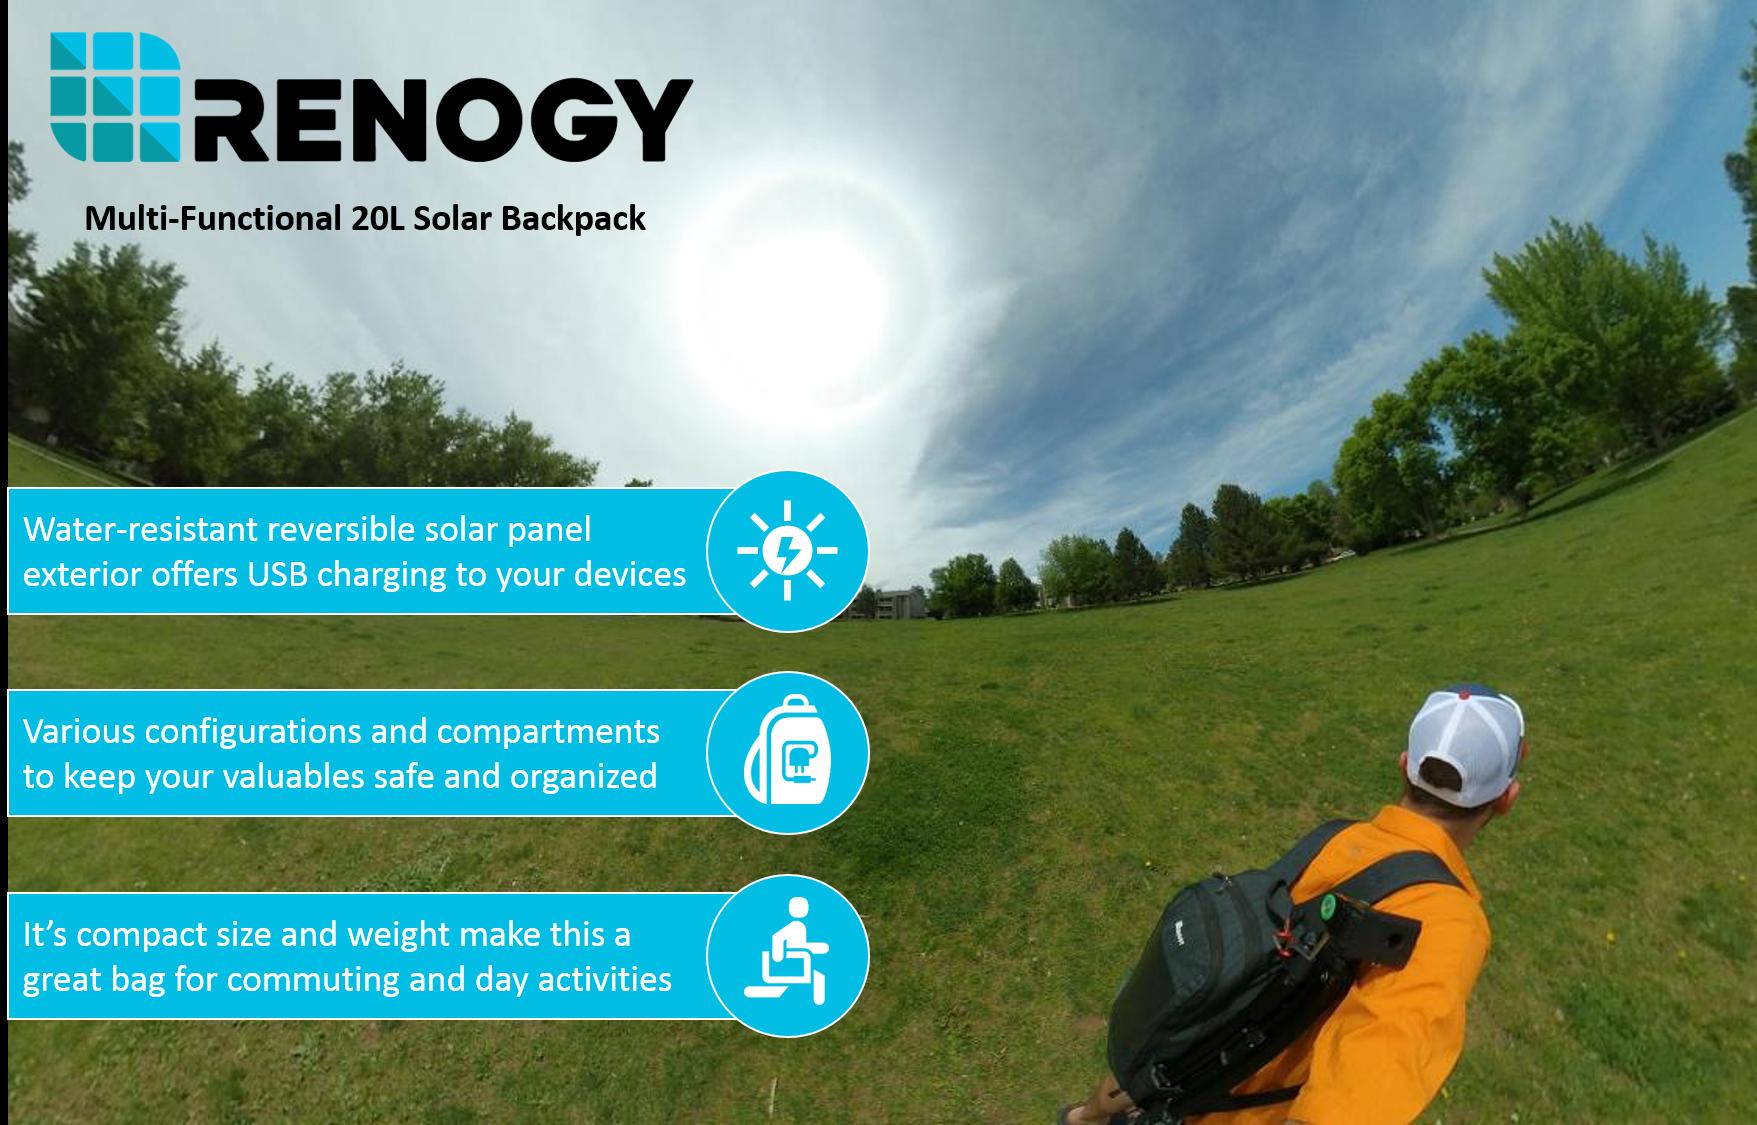 Renogy Backpack Review Image.png